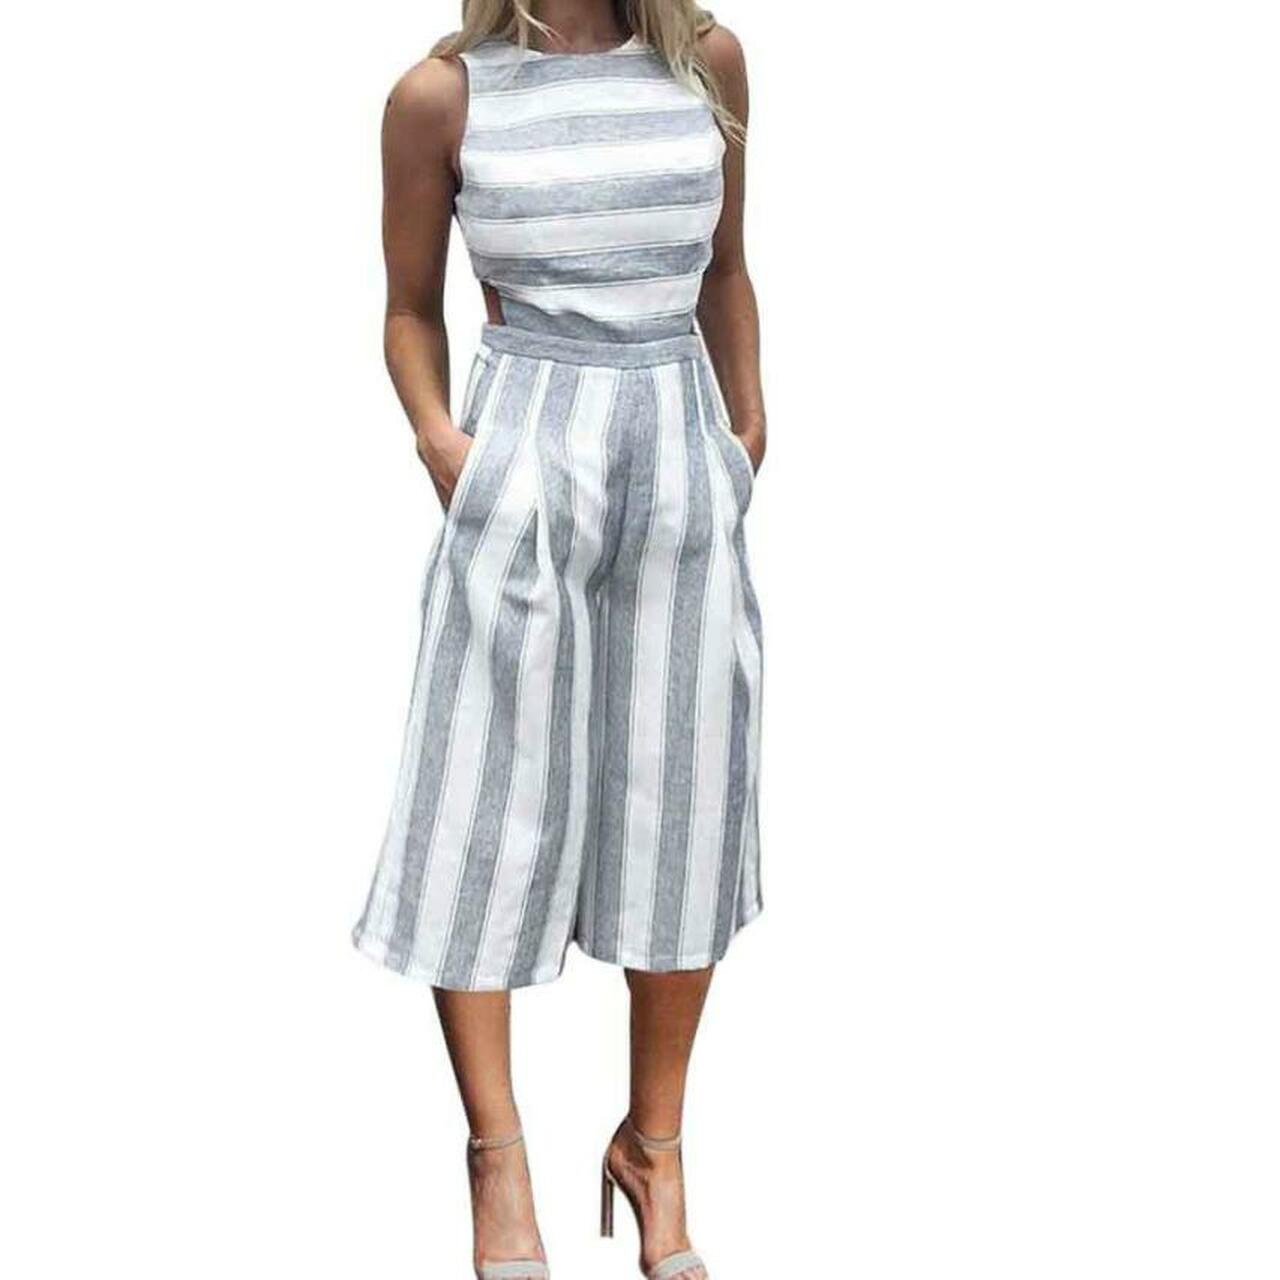 2299c113bf7 ... 2017 Women s Sleeveless Striped Jumpsuit Casual Loose Trousers  Fashionable Leotard Catsuit Combinaison Wide Leg Pants ...